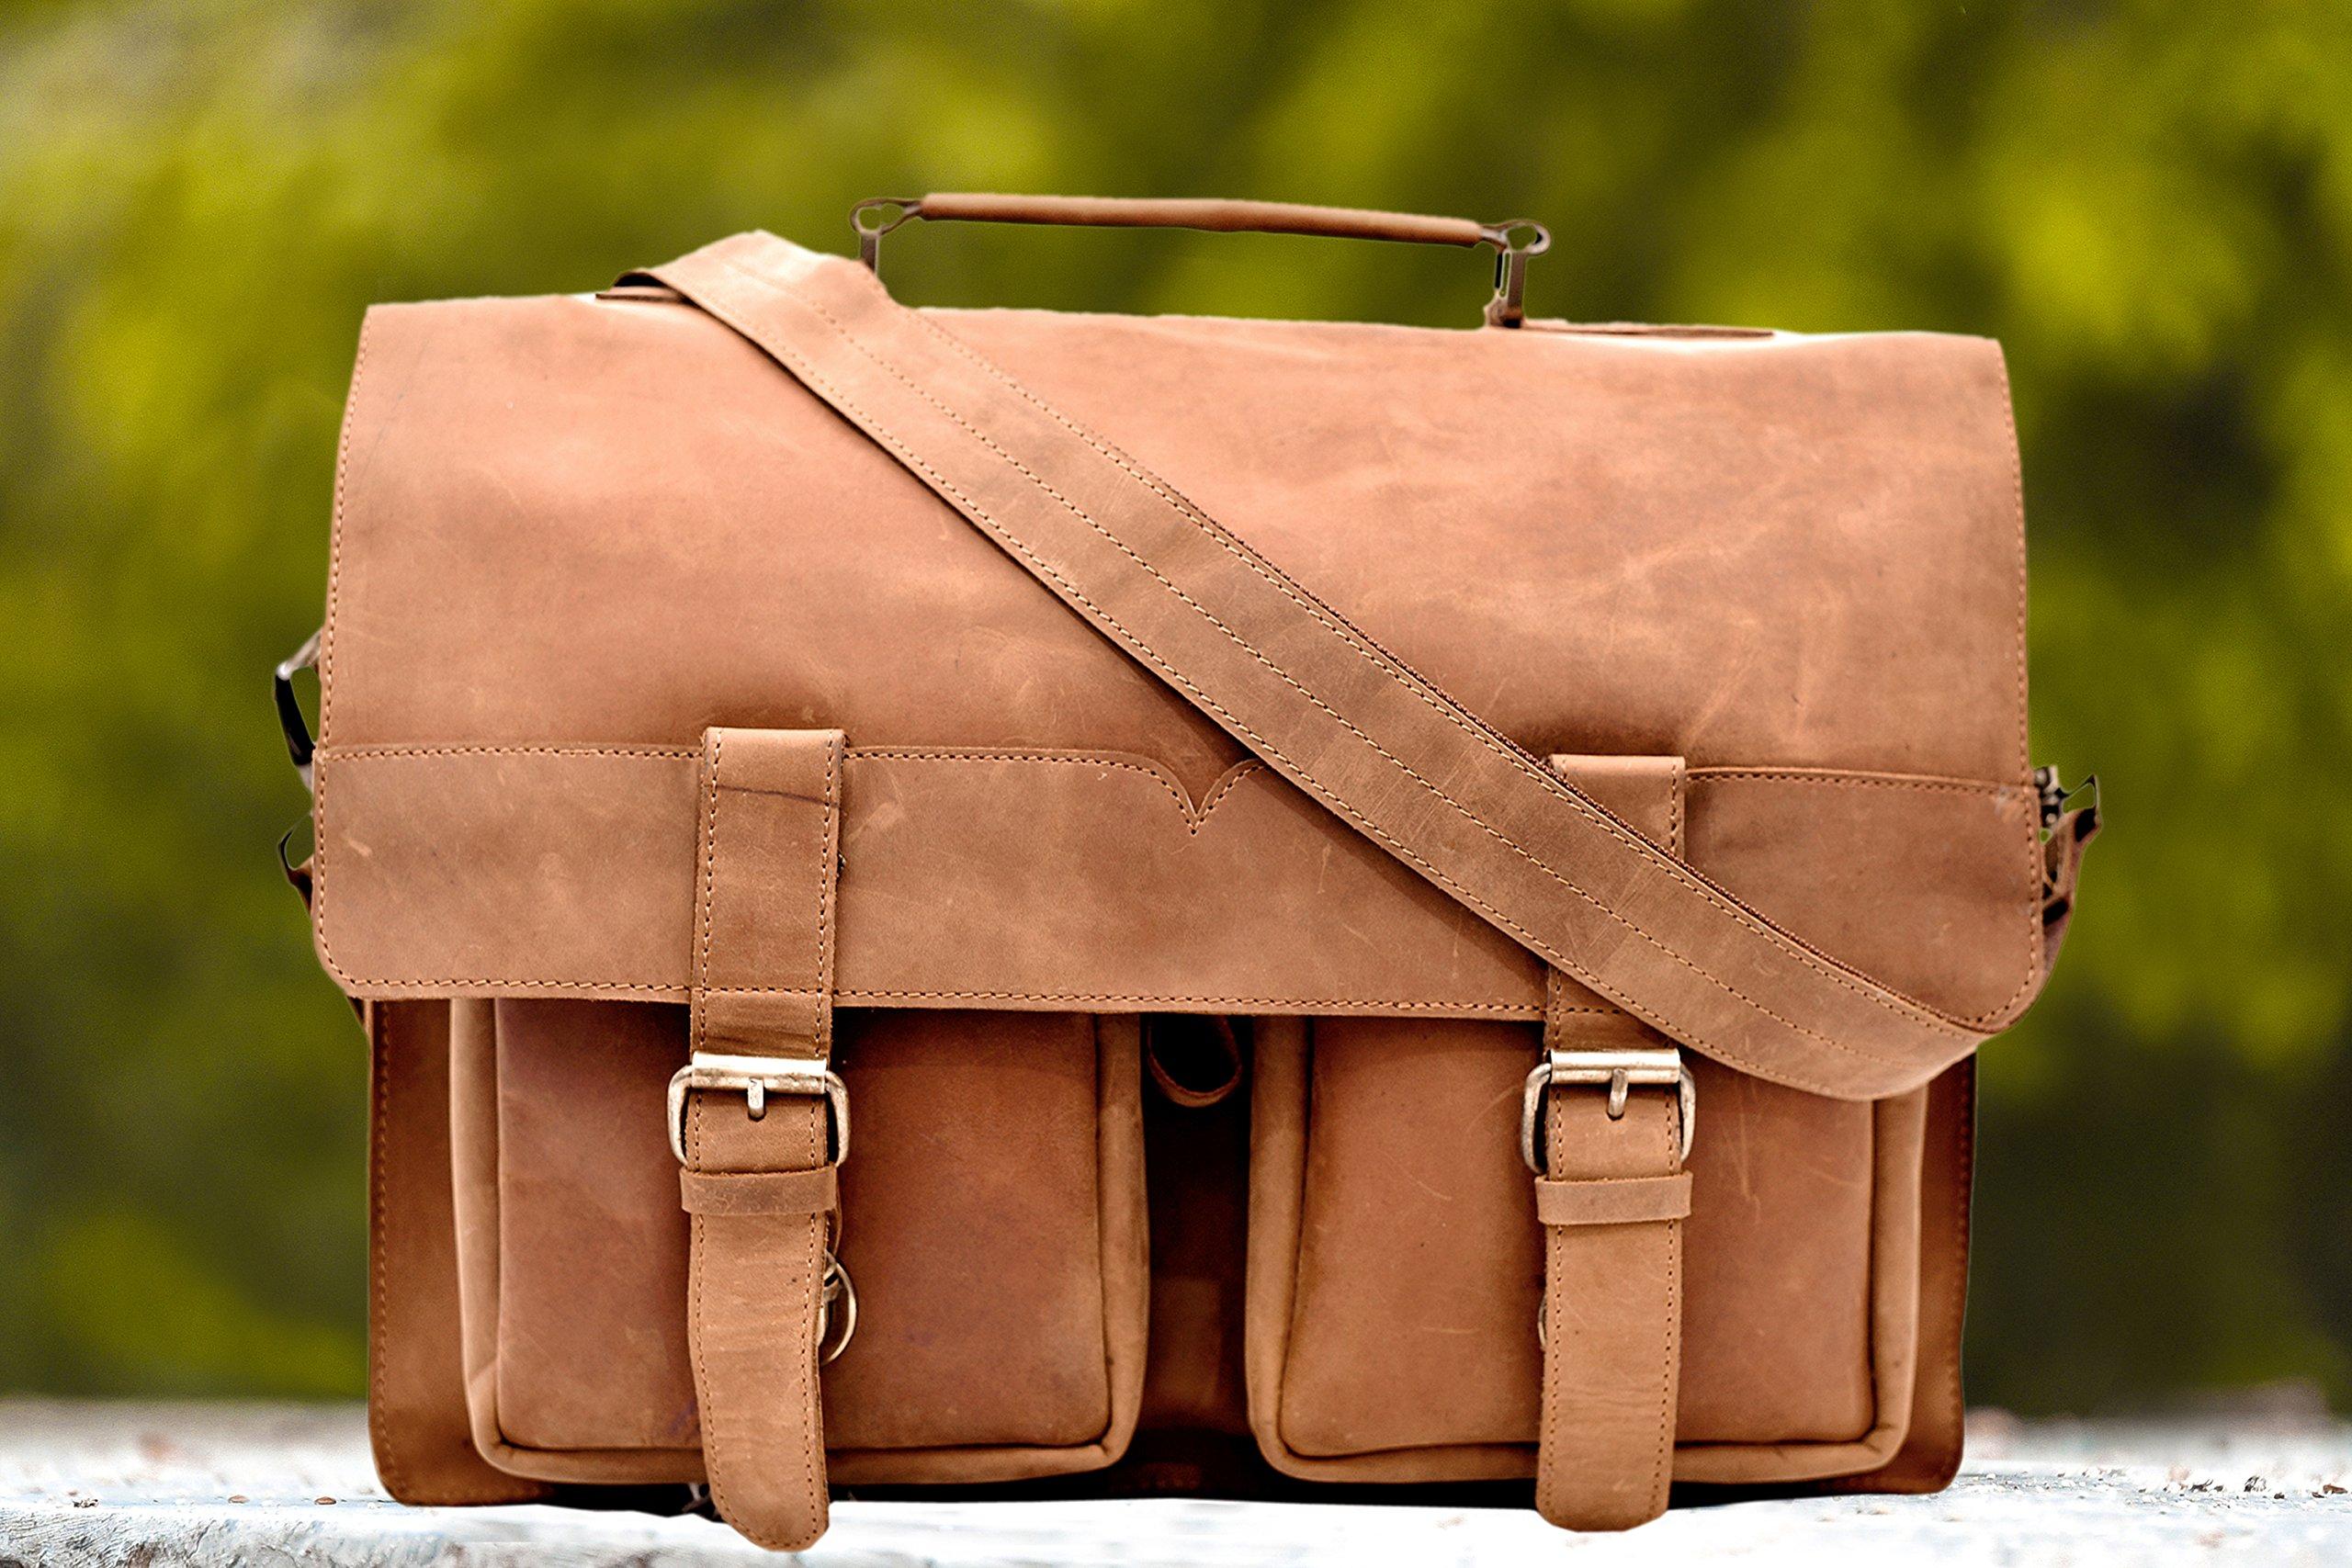 Genuine Leather Bag By Handmade_World 16'' Vintage Buffalo Messenger Satchel Laptop Briefcase Unisex Bags Crazy Briefcase Bags For Men Women